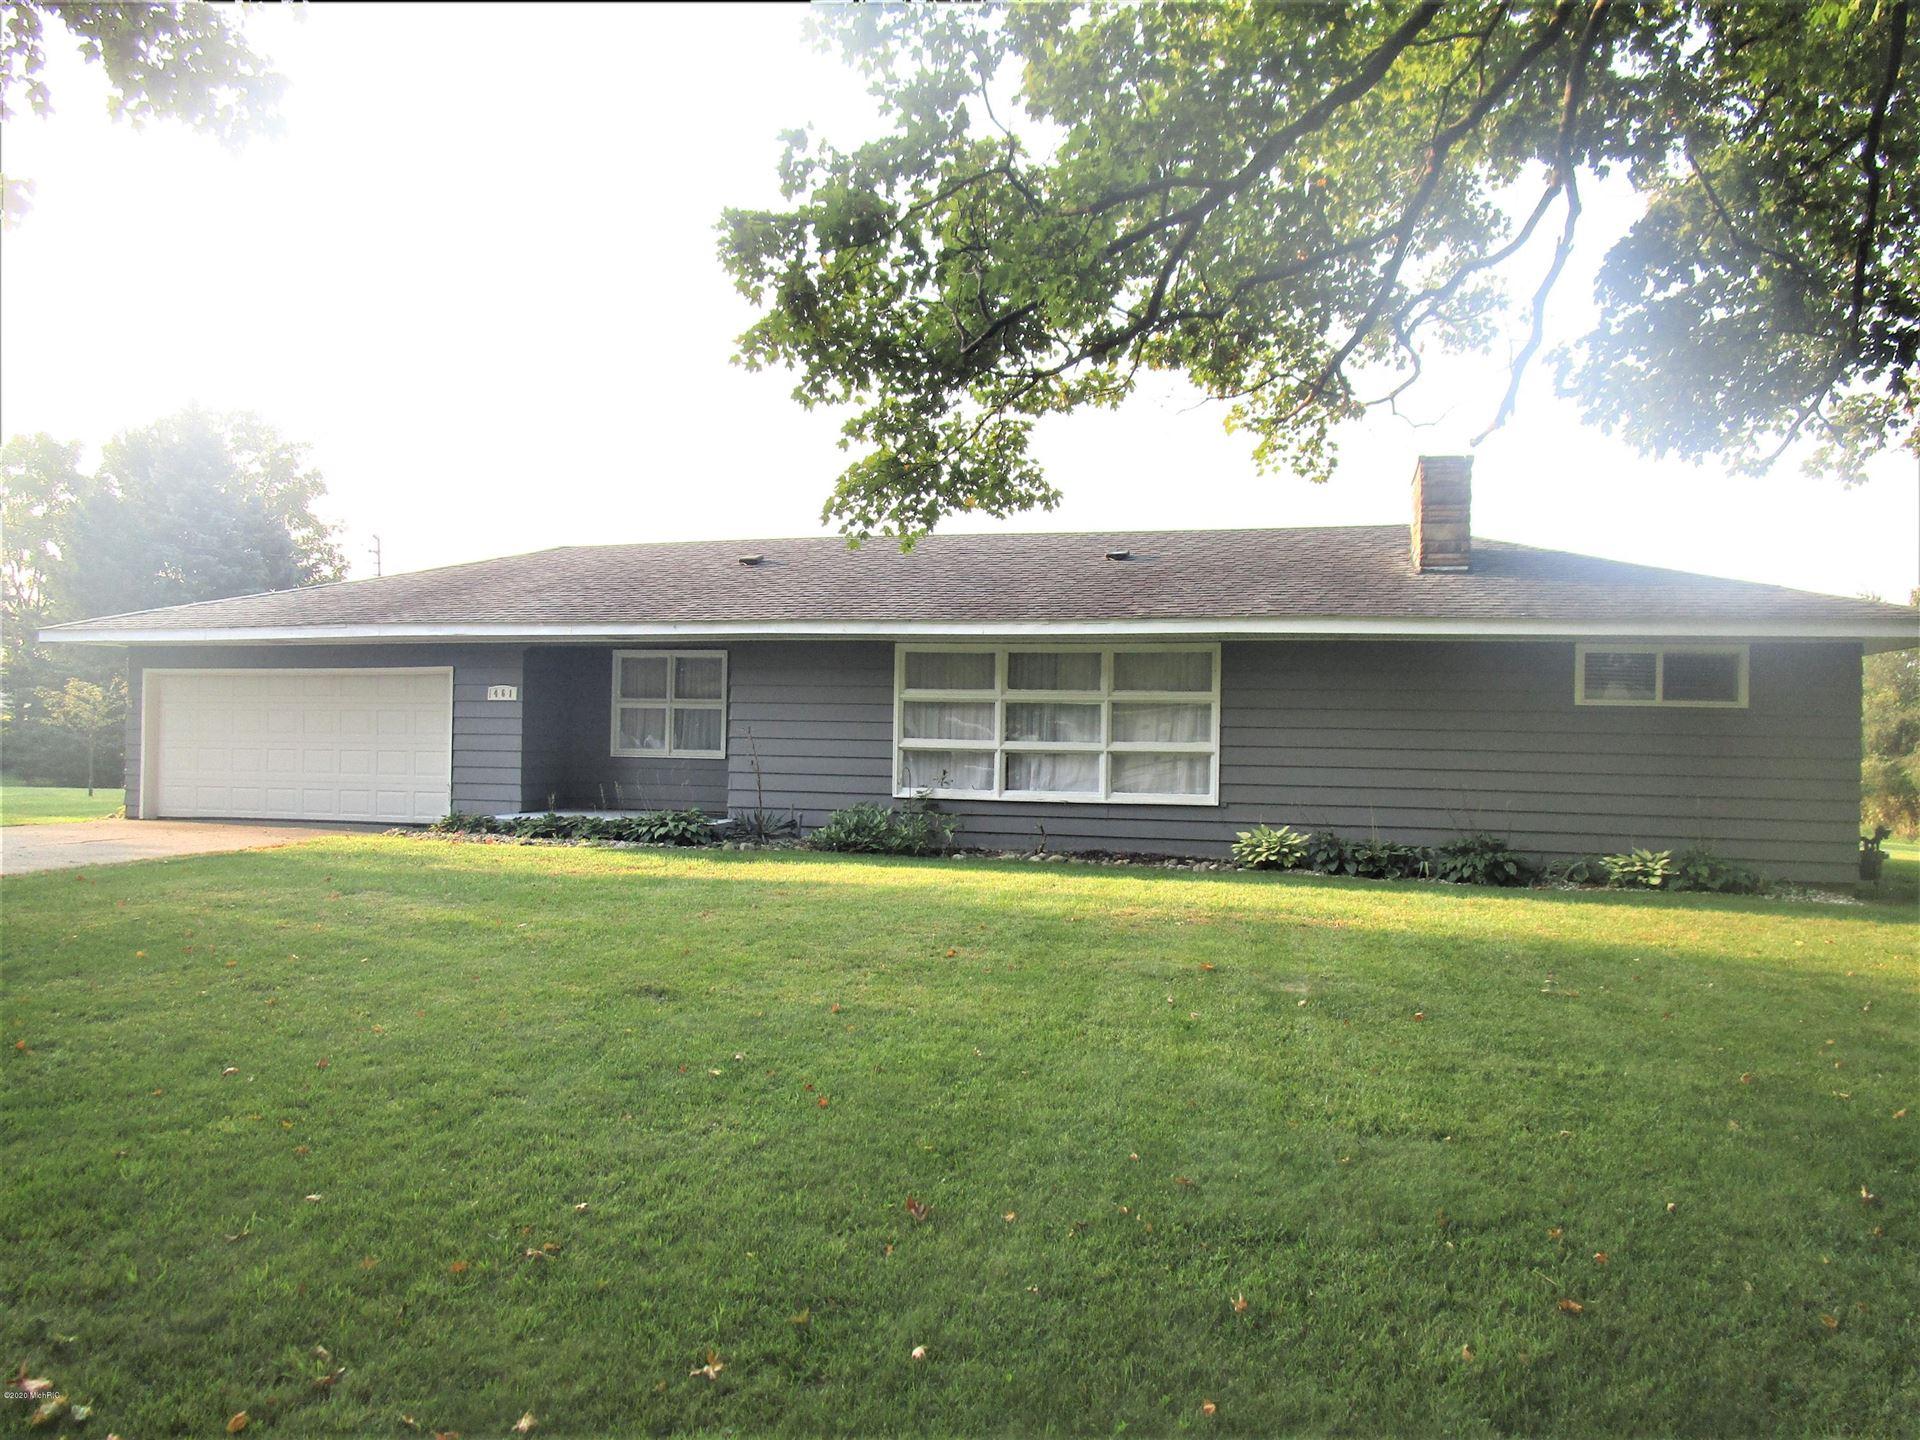 461 Dorrance Road, Coldwater, MI 49036 - MLS#: 20039987